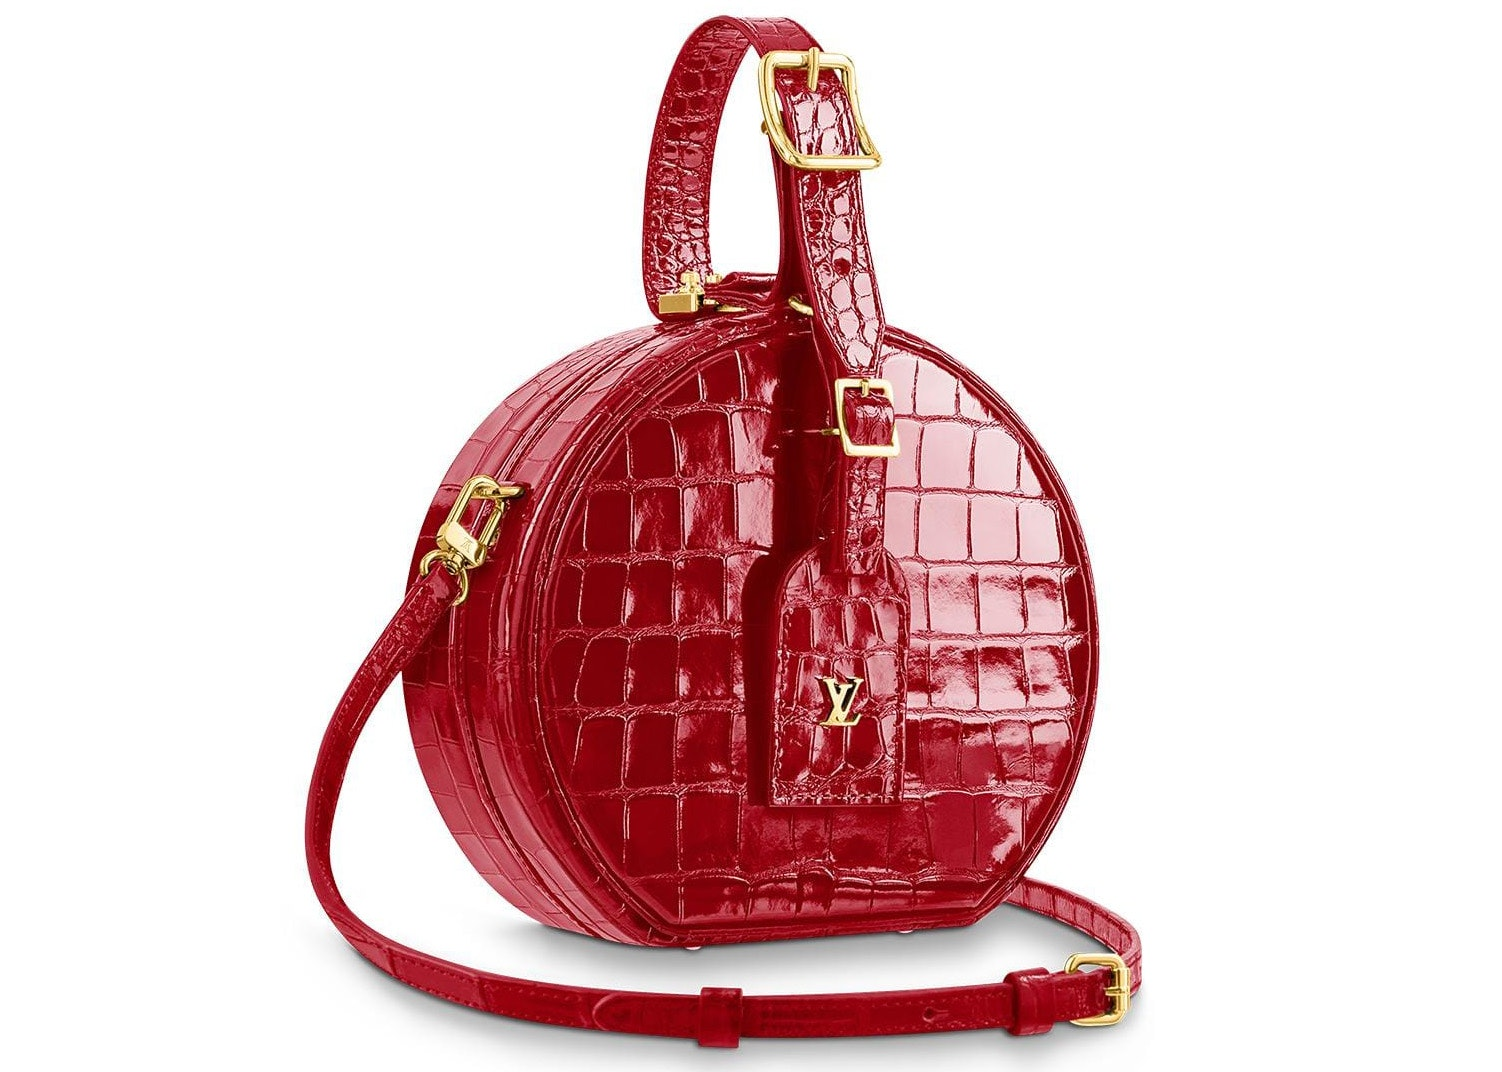 Louis Vuitton Petite Boite Chapeau Crocodile Leather Gold-tone Cerise